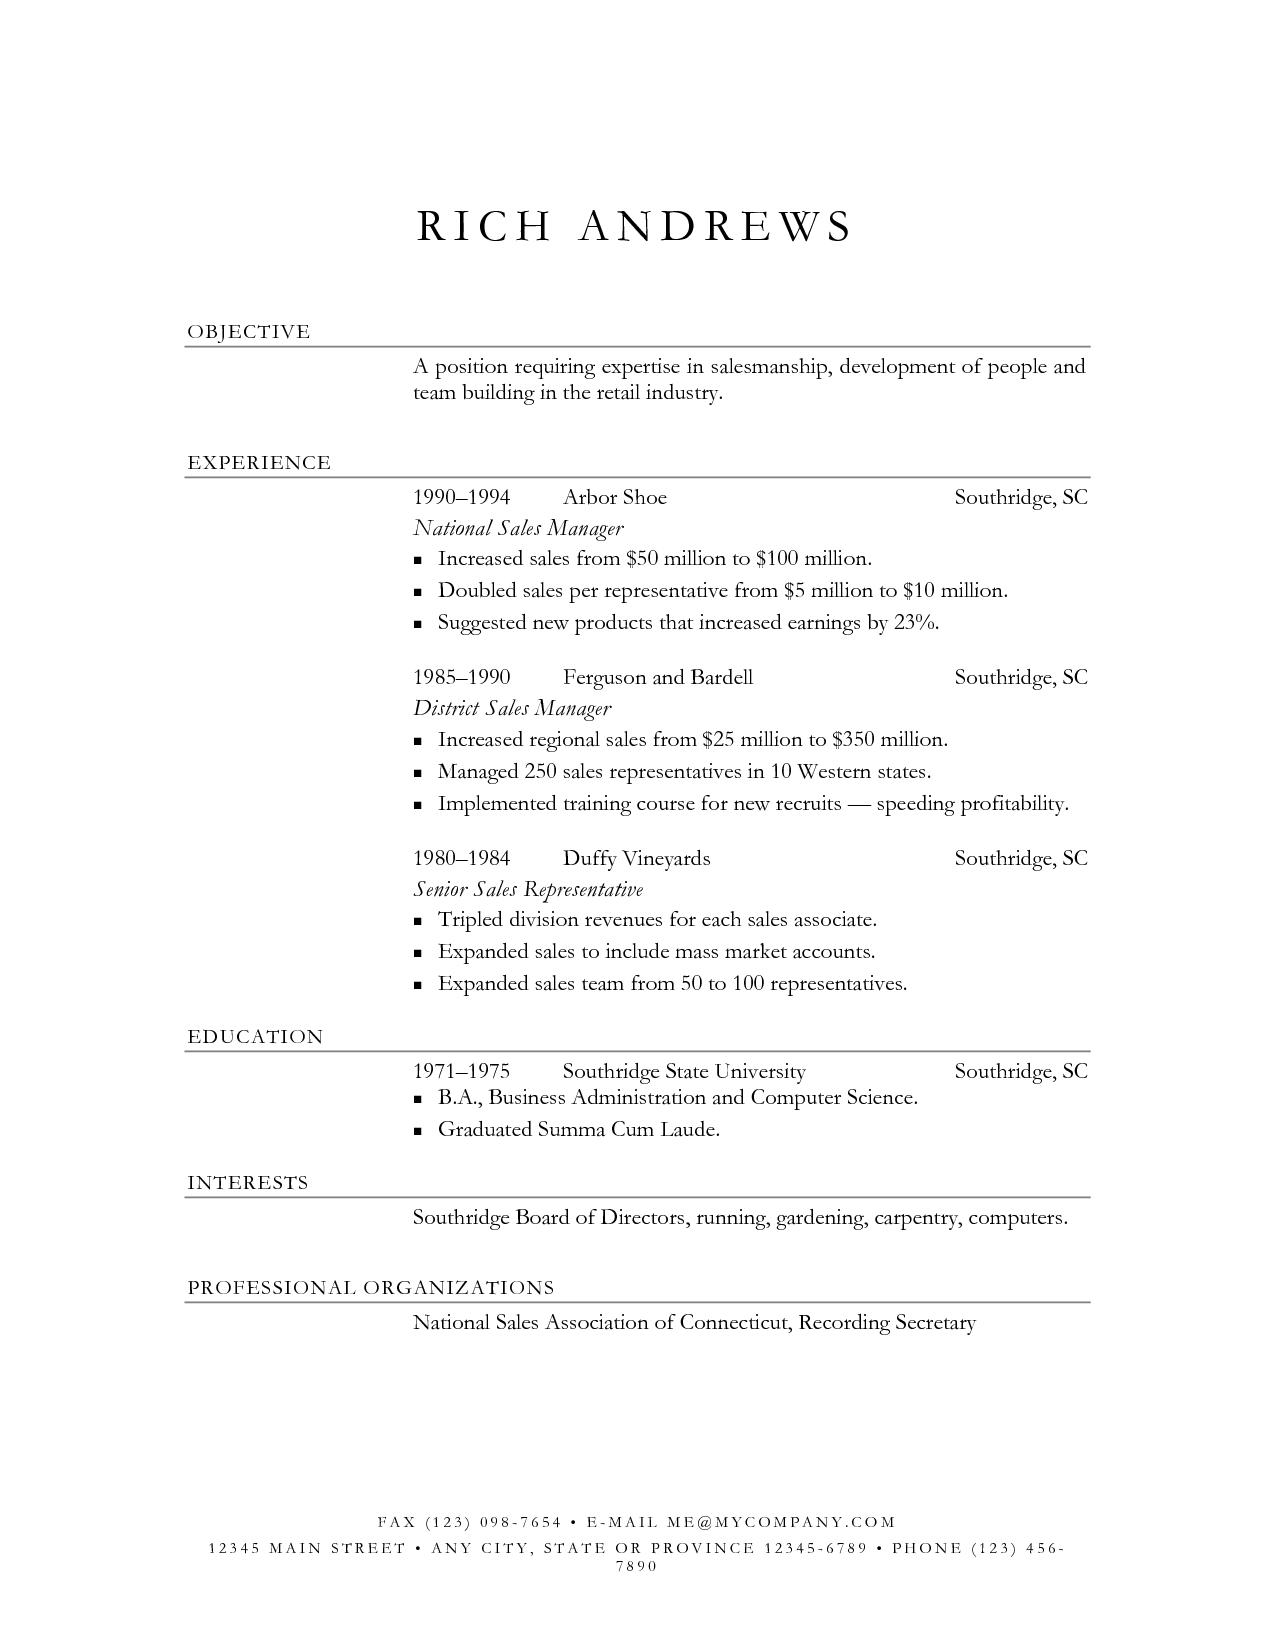 Resume Elegant Resume elegant resume format format